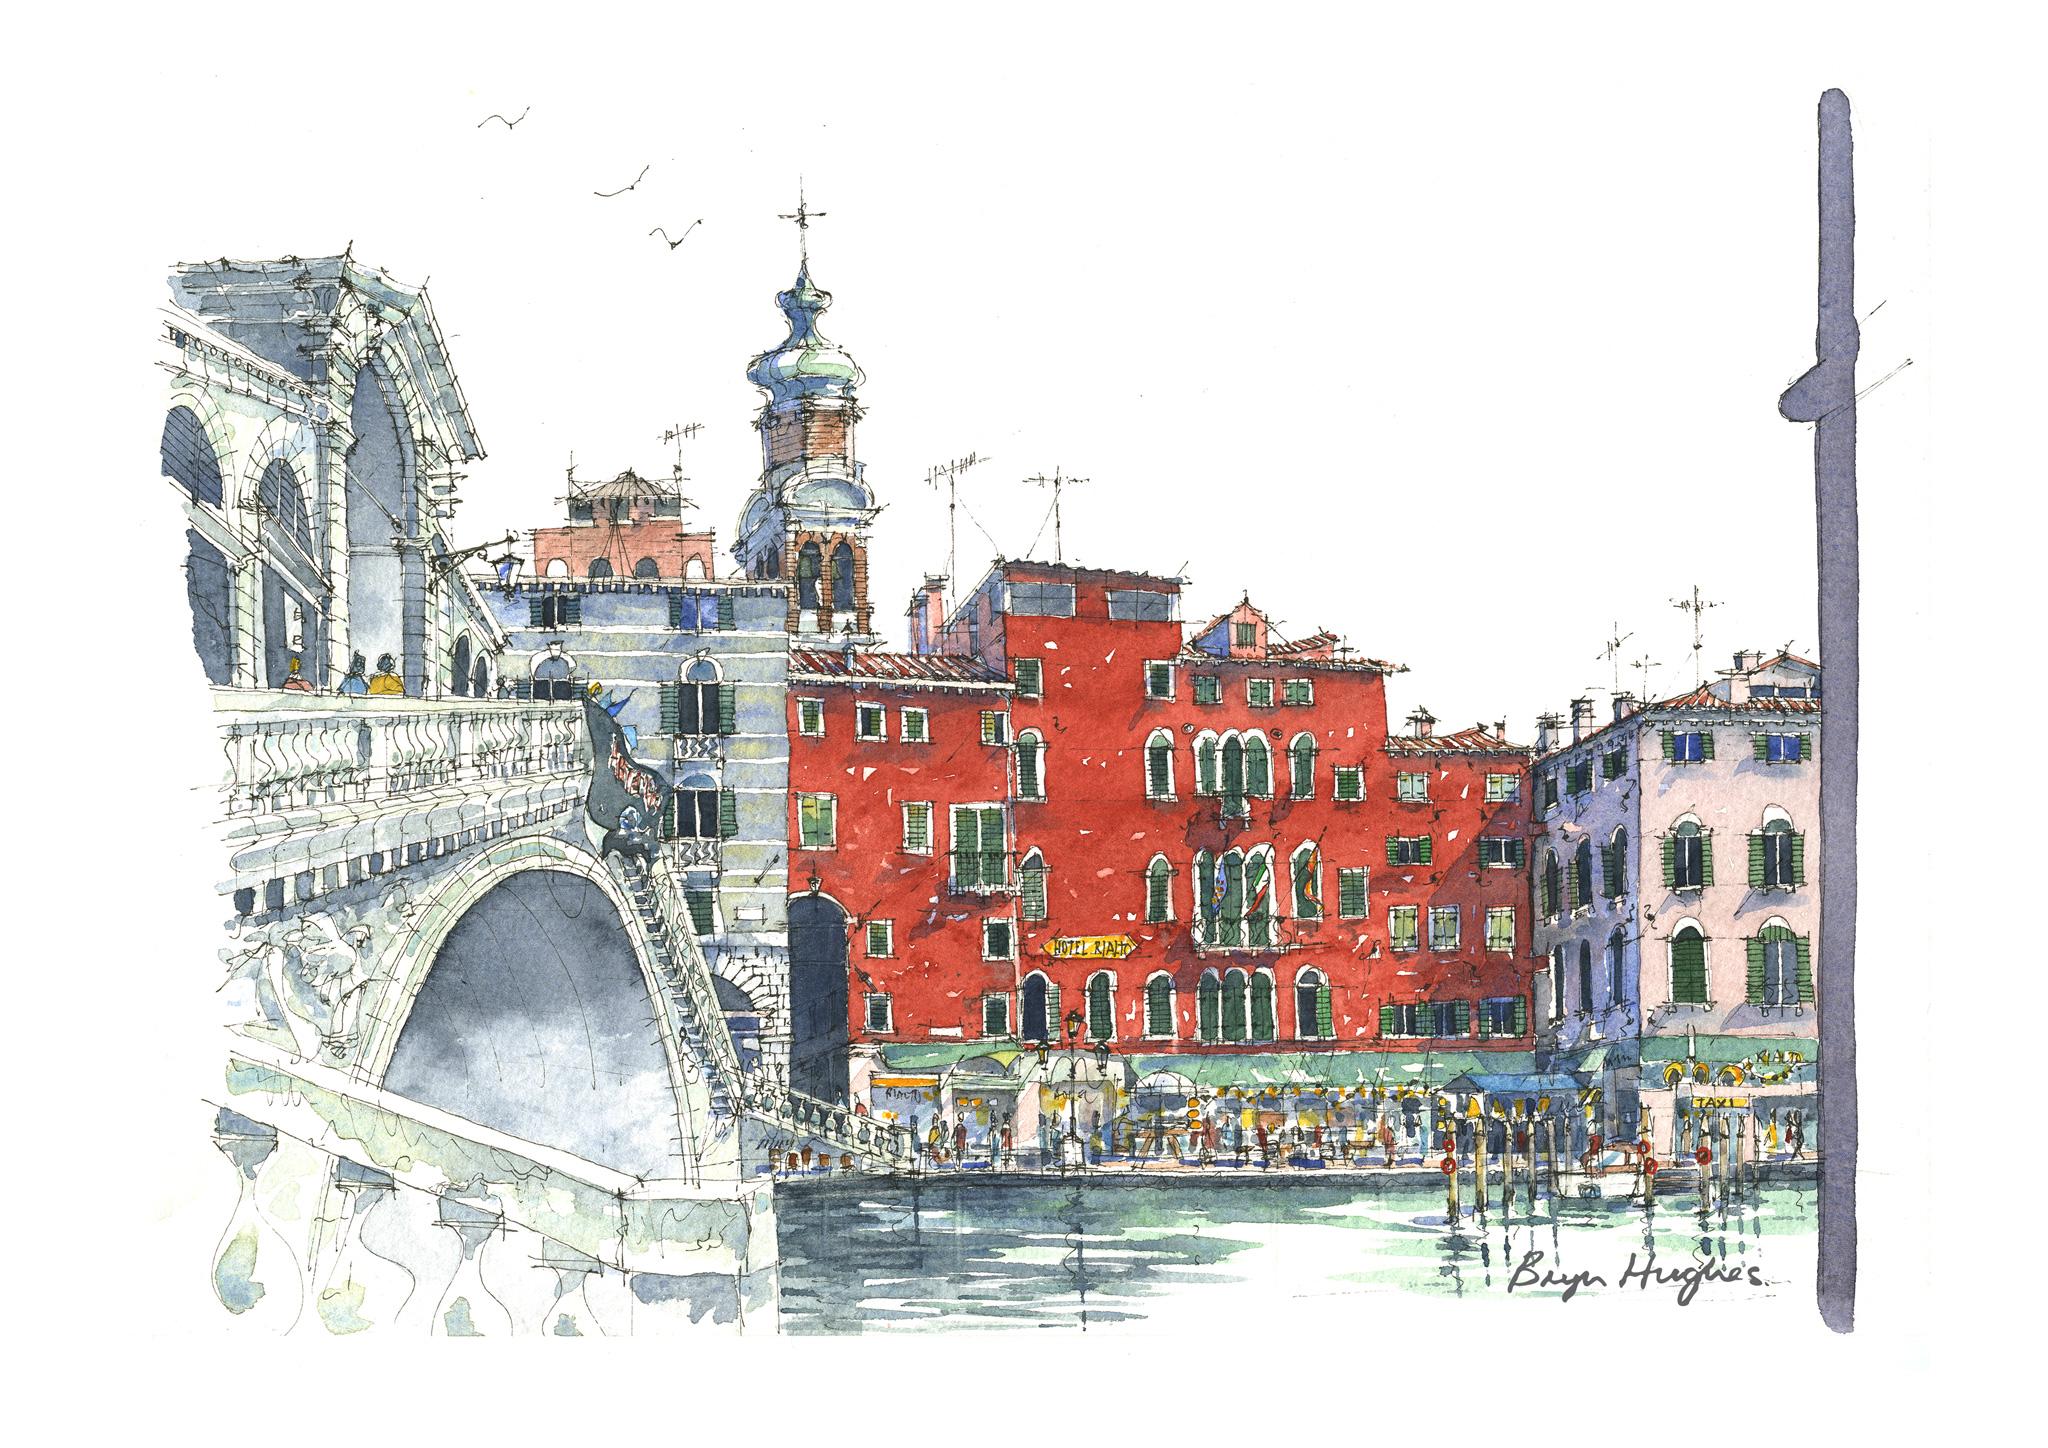 BH002-Venice.jpg